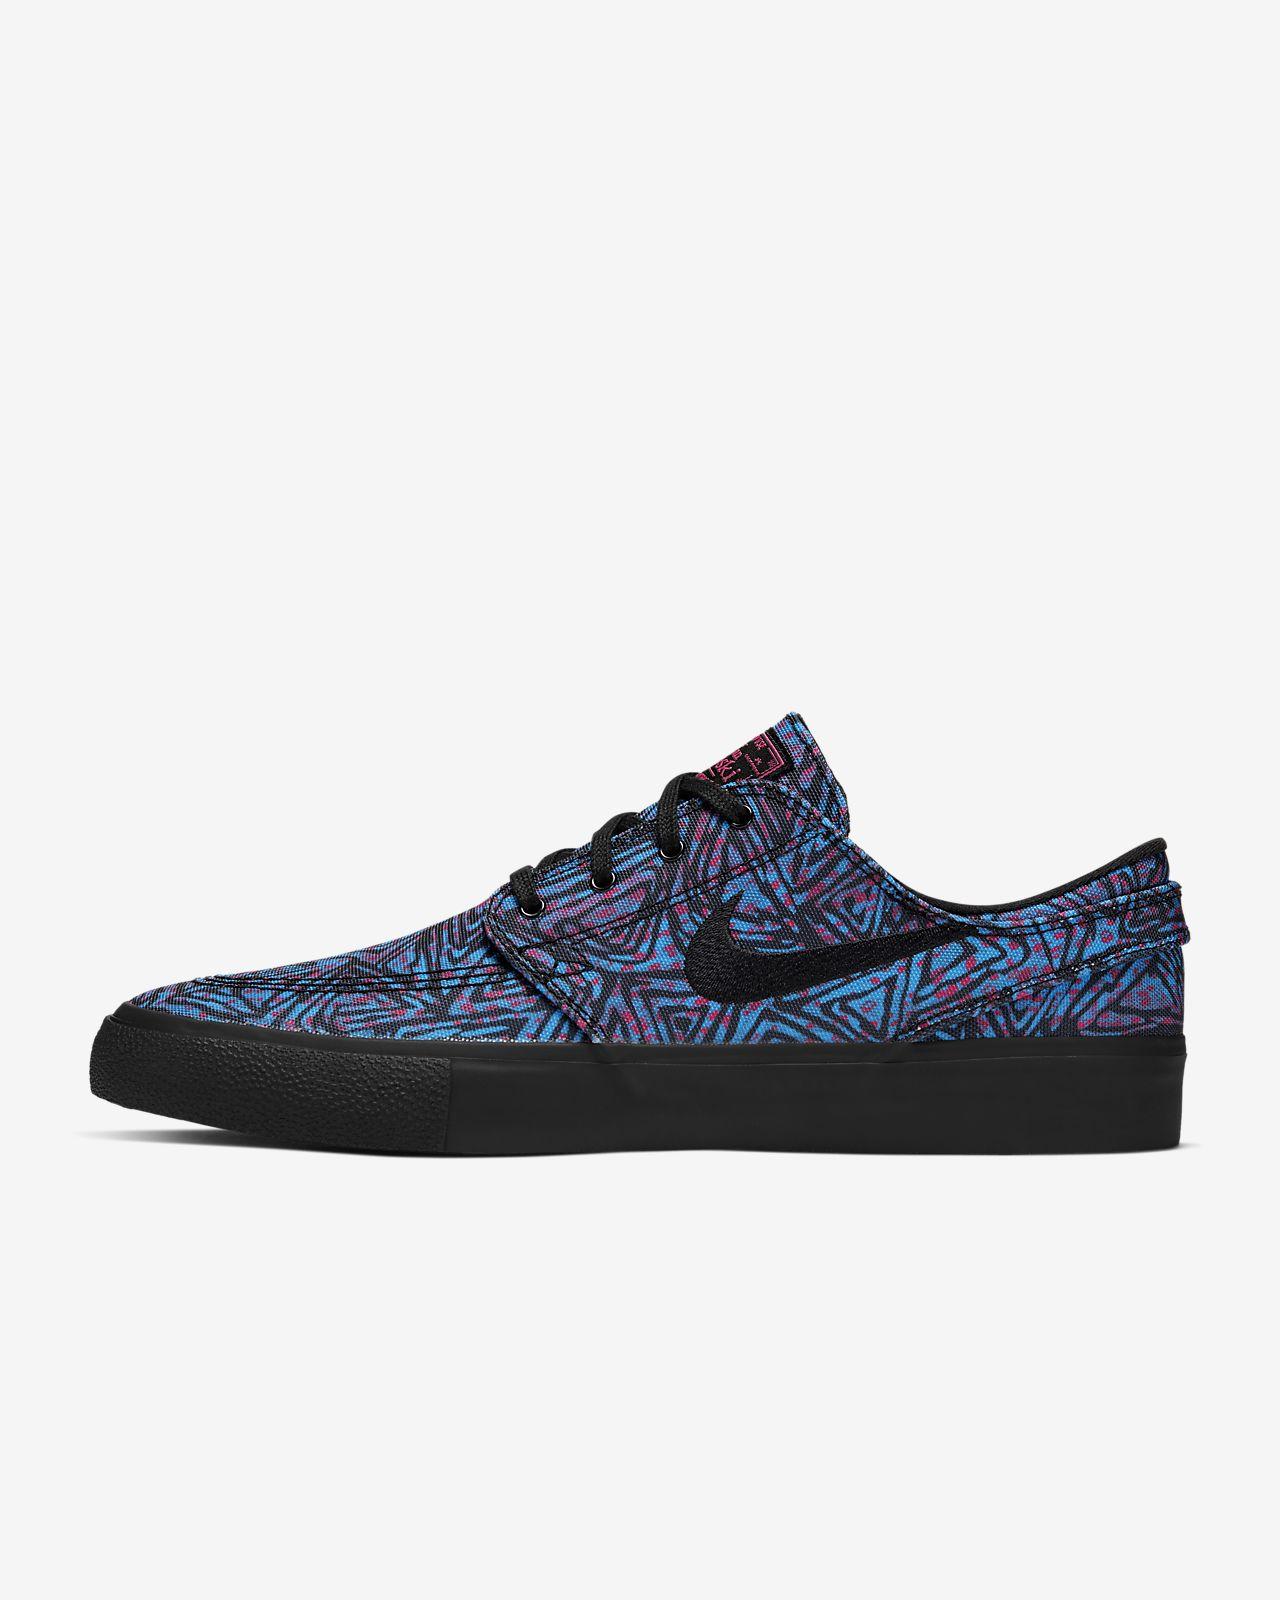 Nike SB Zoom Stefan Janoski Canvas RM Premium 滑板鞋